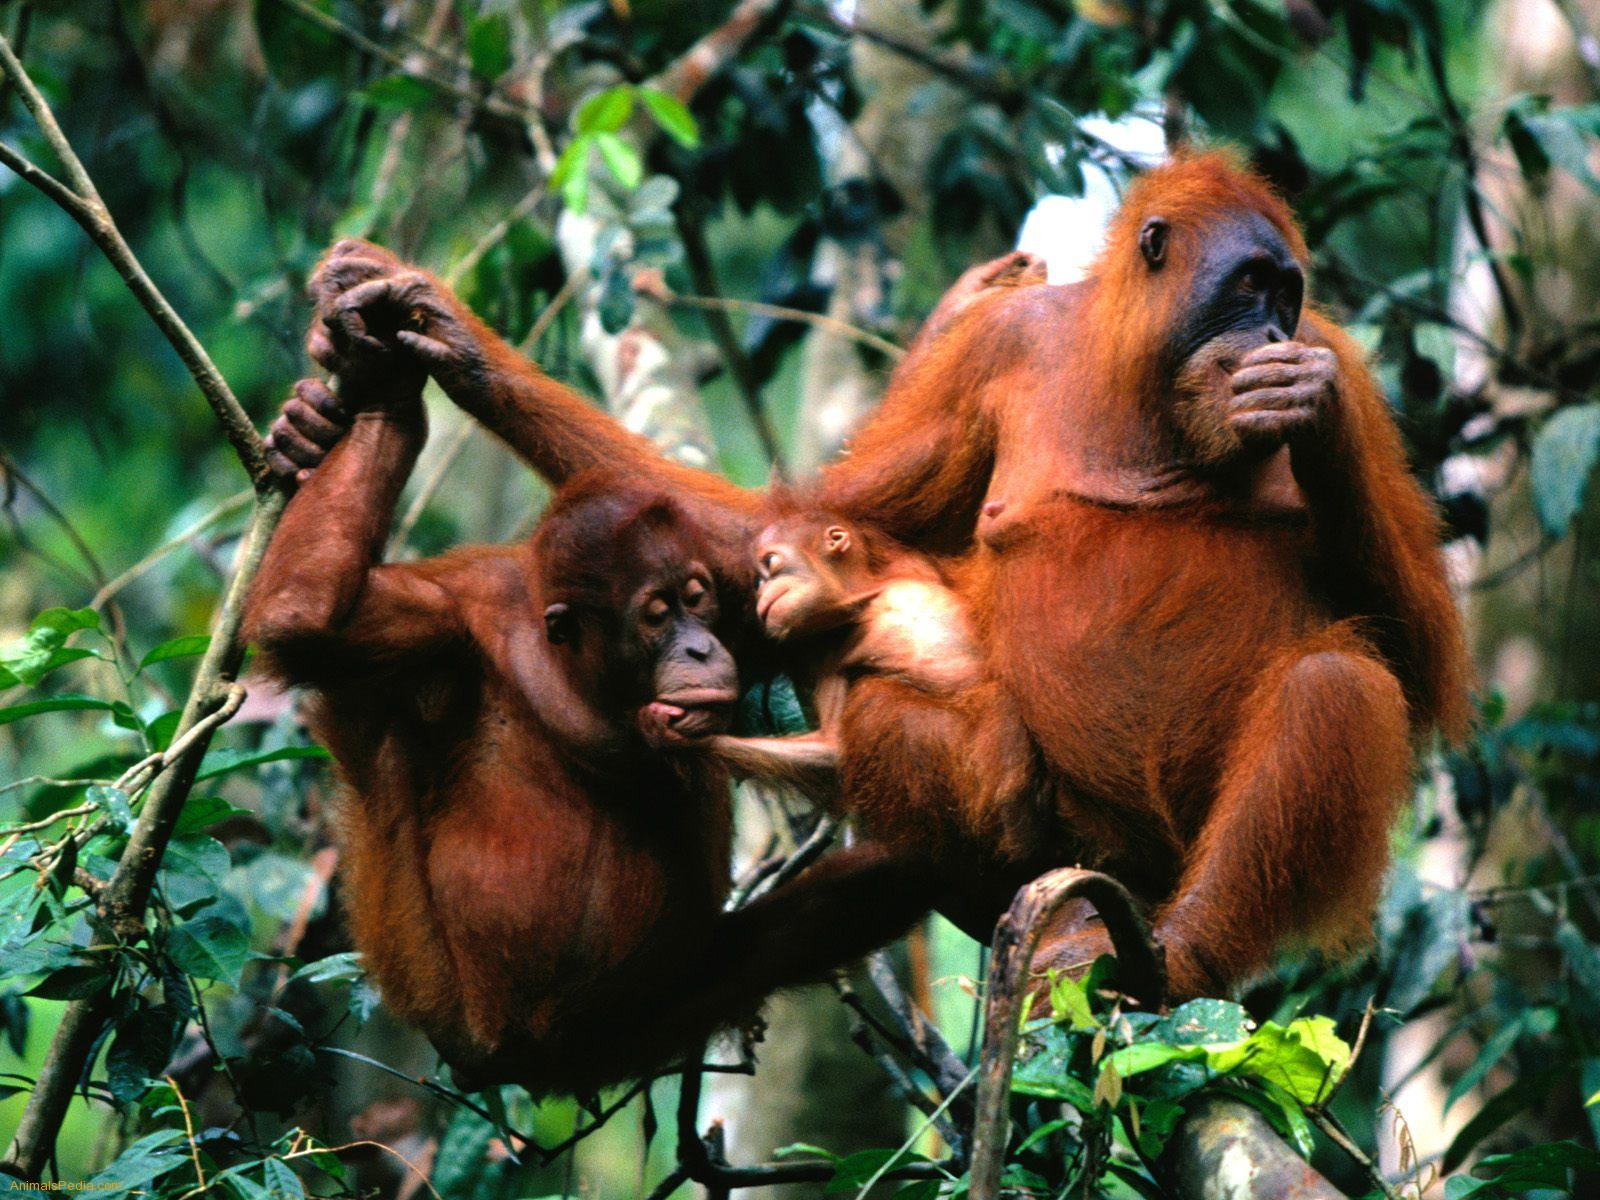 Orangutans Pets Cute And Docile